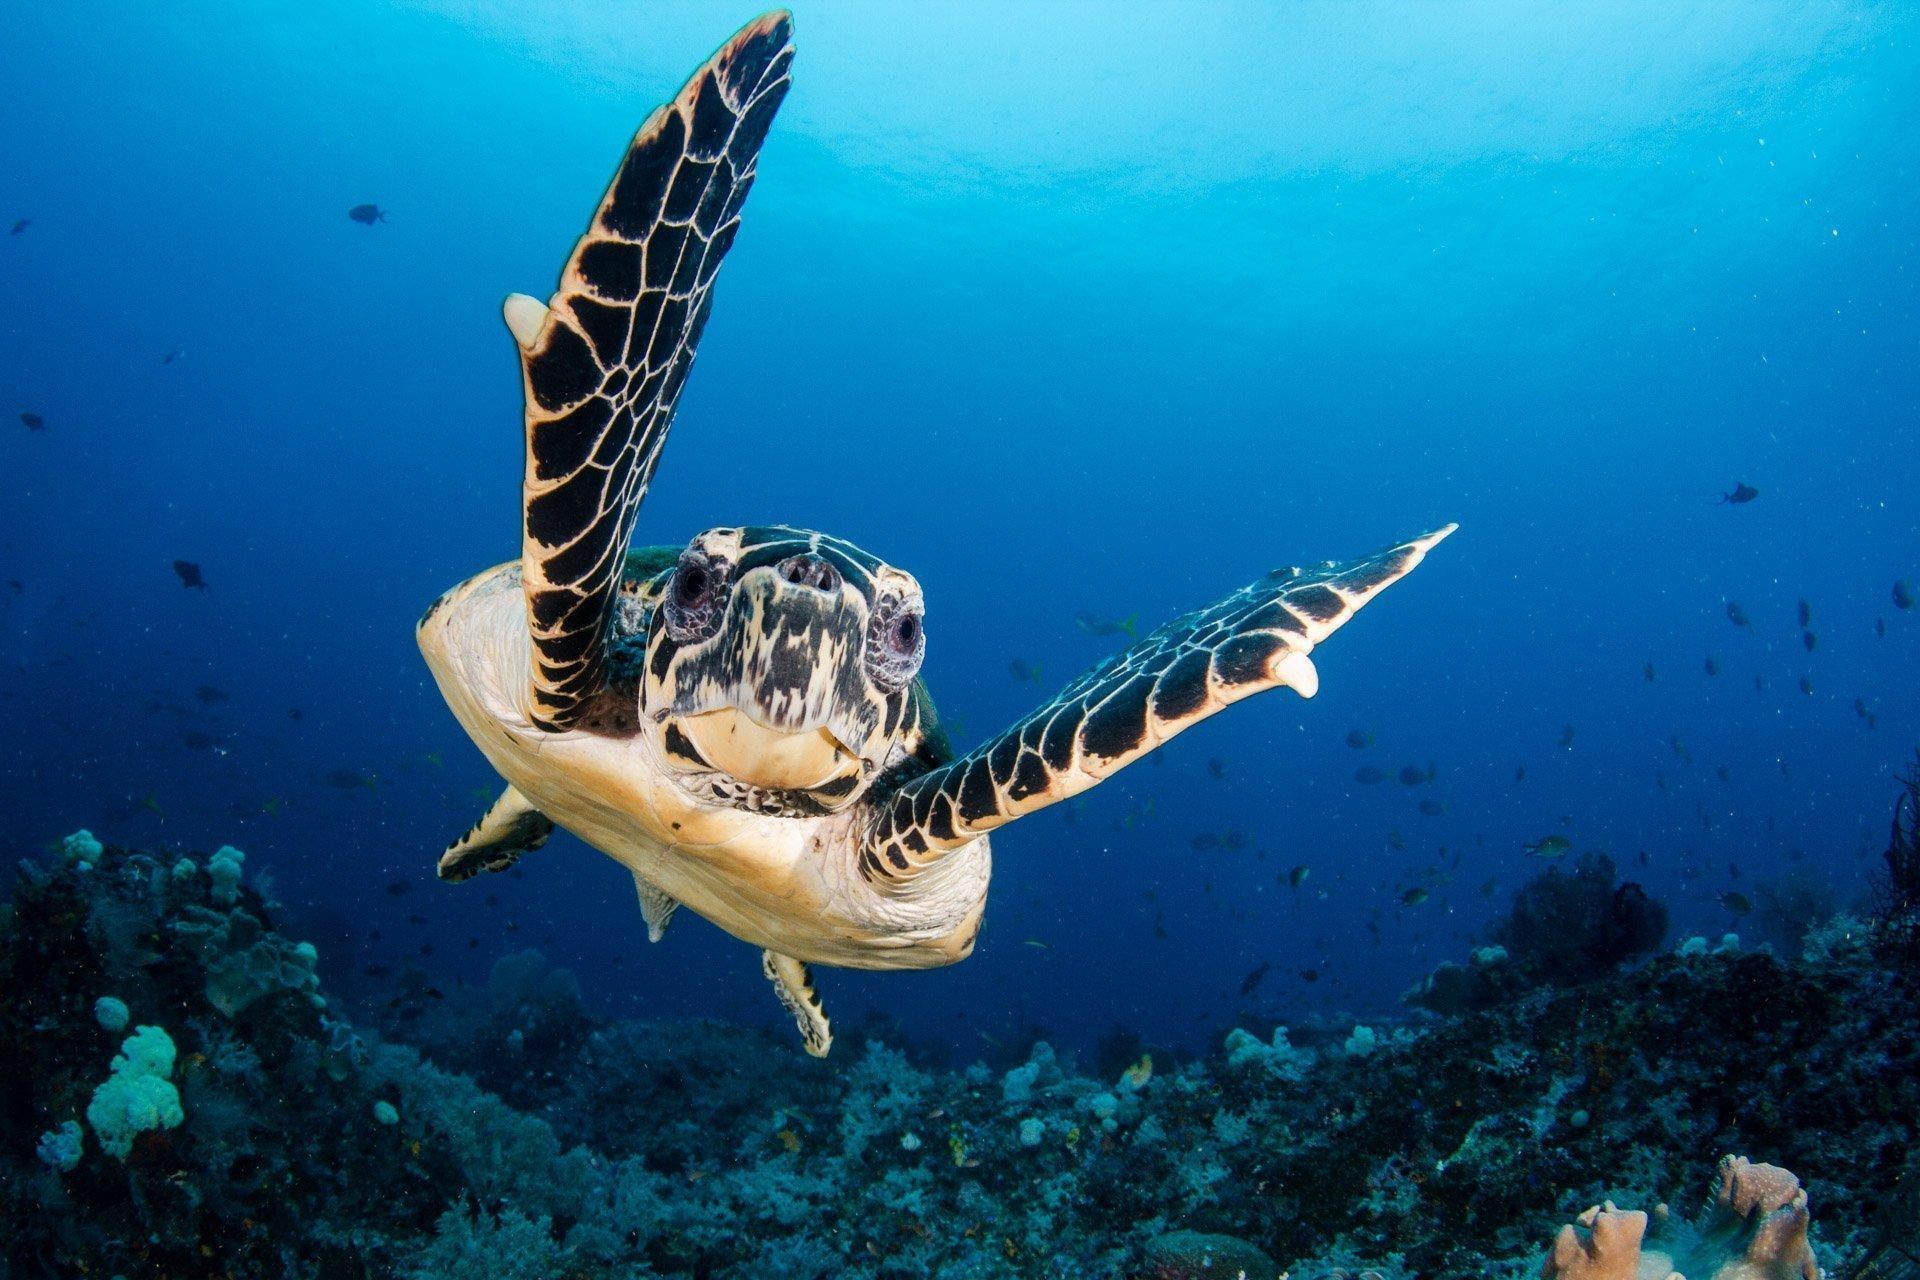 hawksbill turtle looking into camera lens